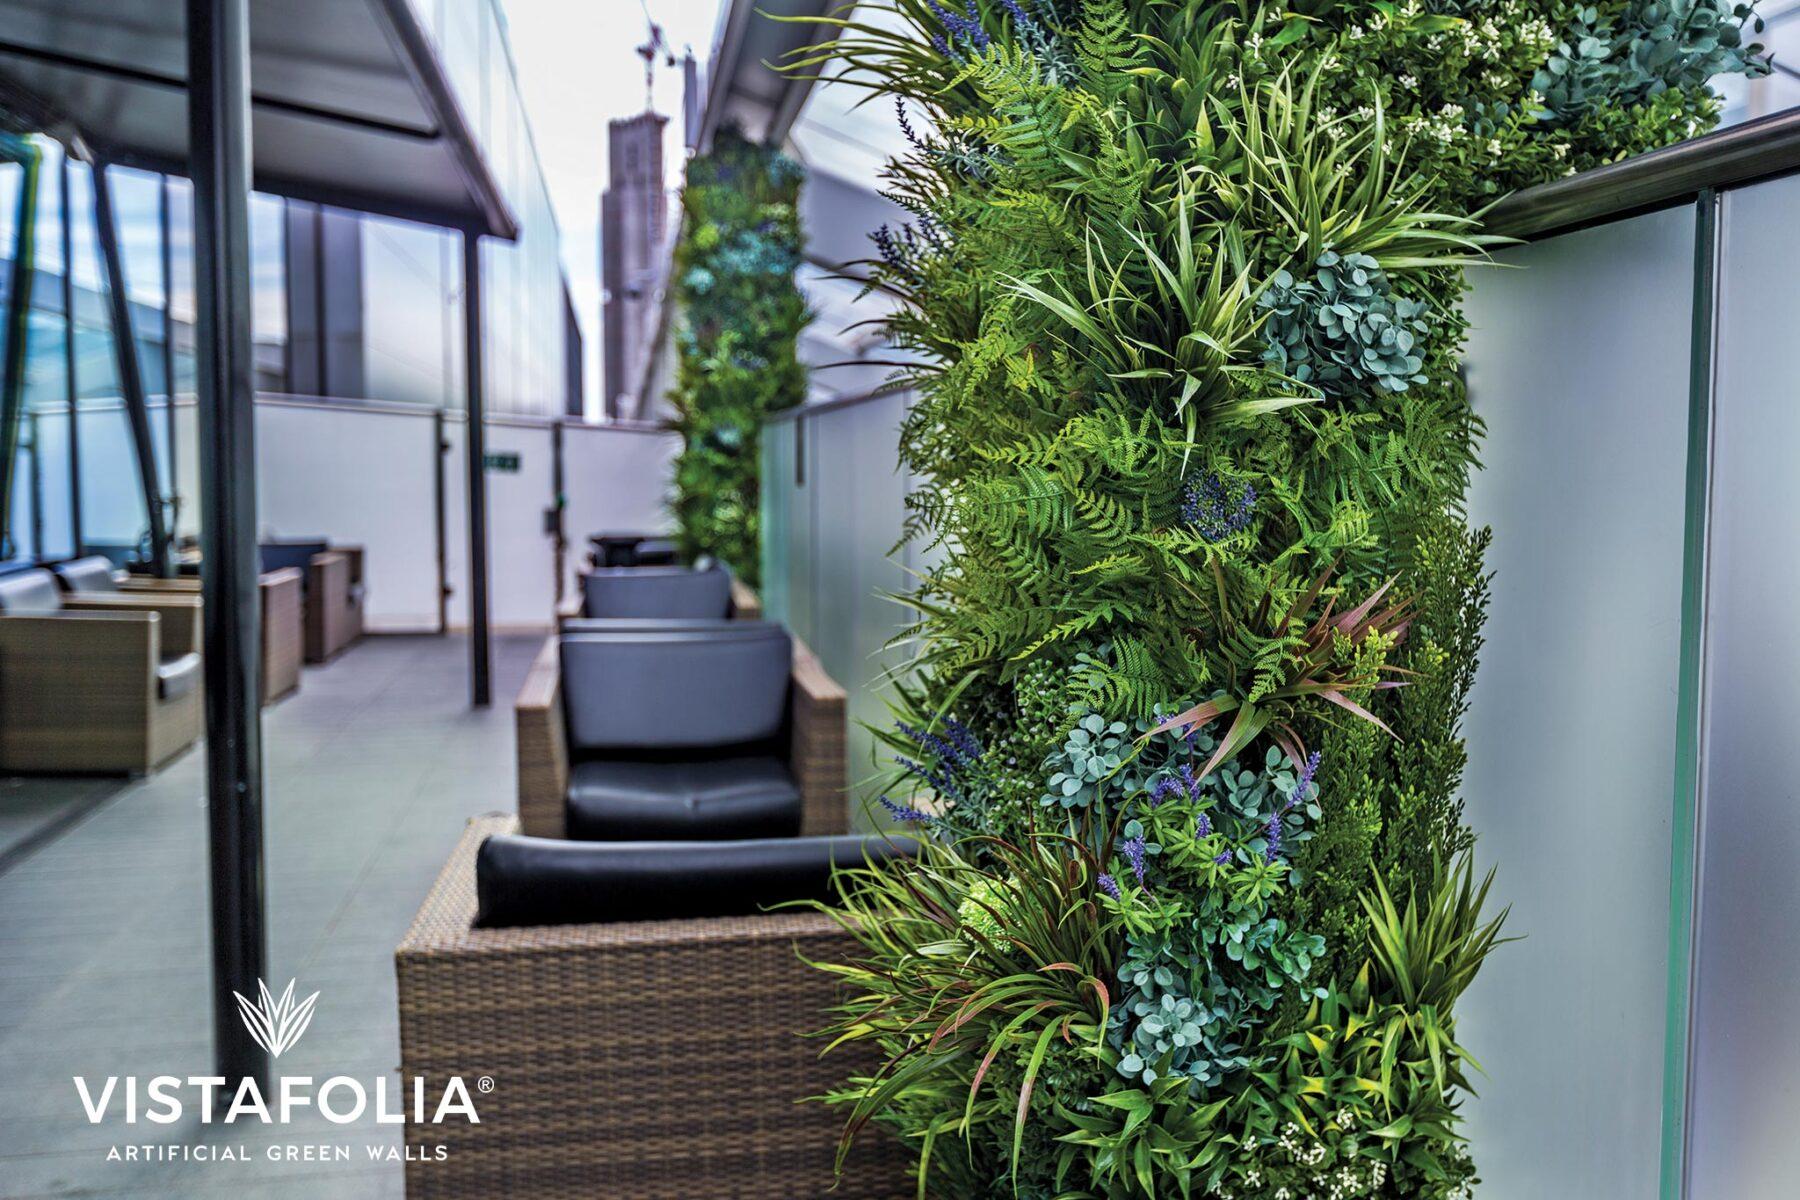 artificial green walls in new york, vistafolia